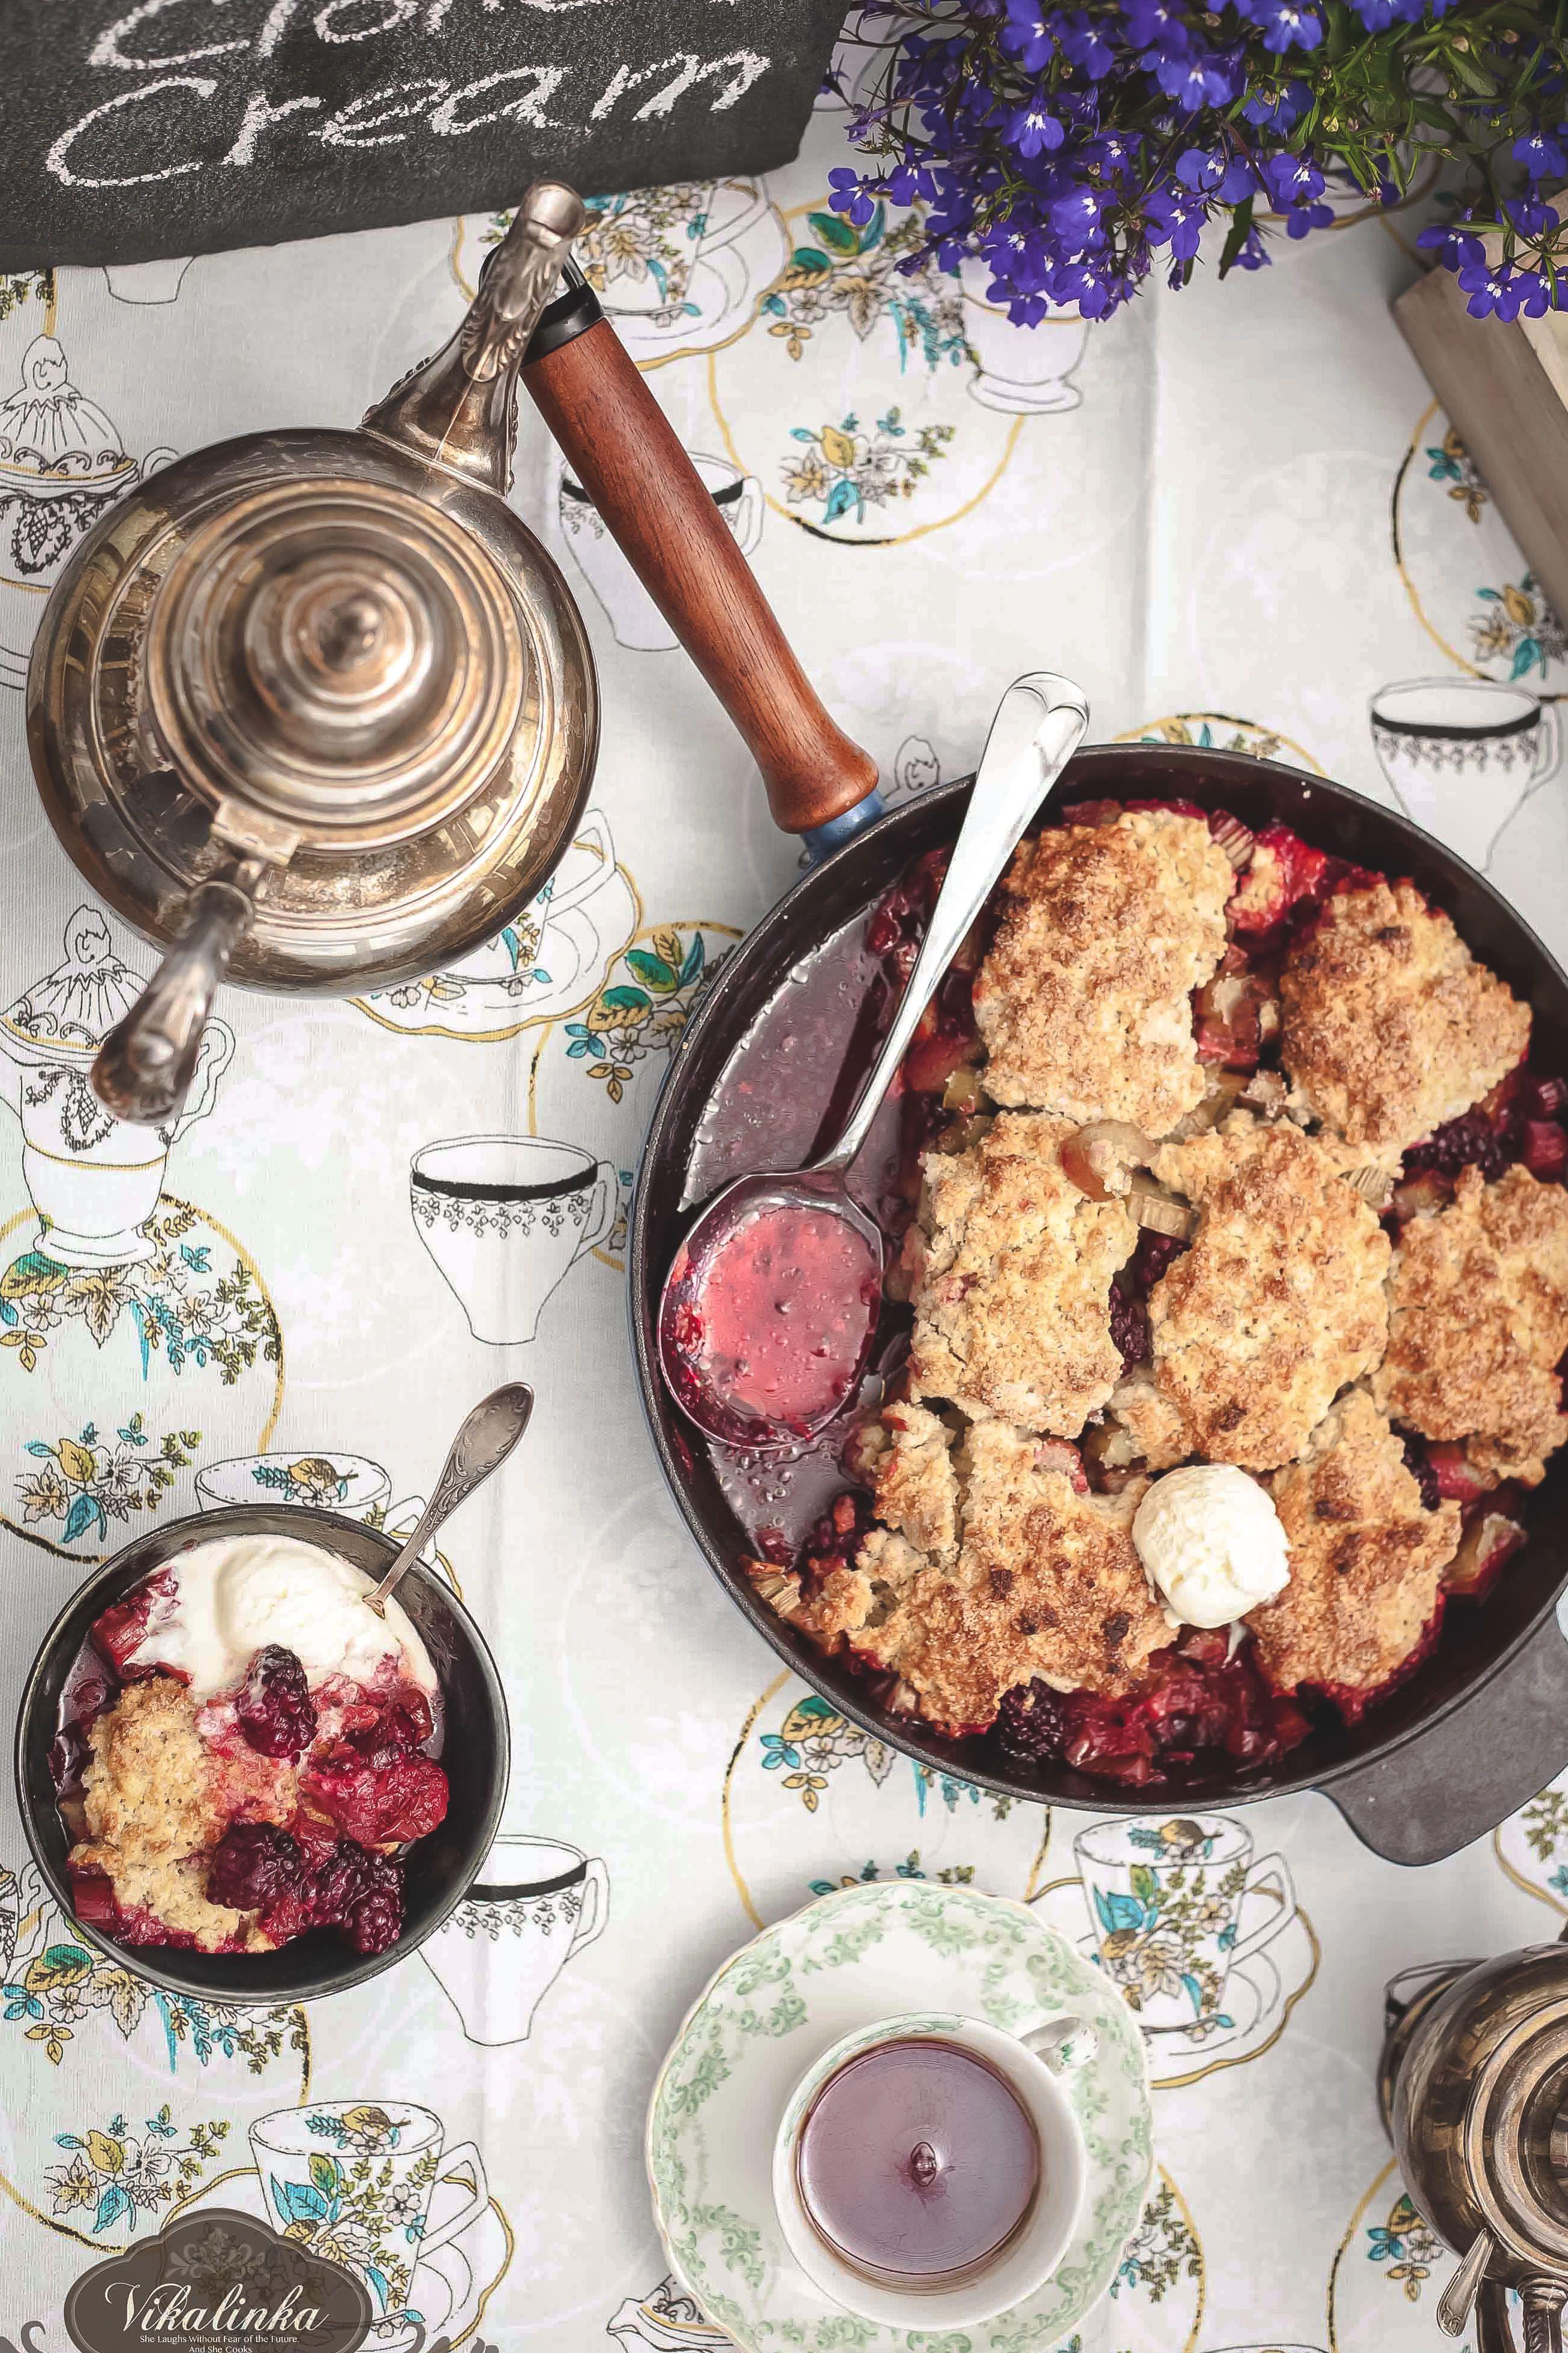 Rhubarb Blackberry Cobbler with Clotted Cream Ice Cream